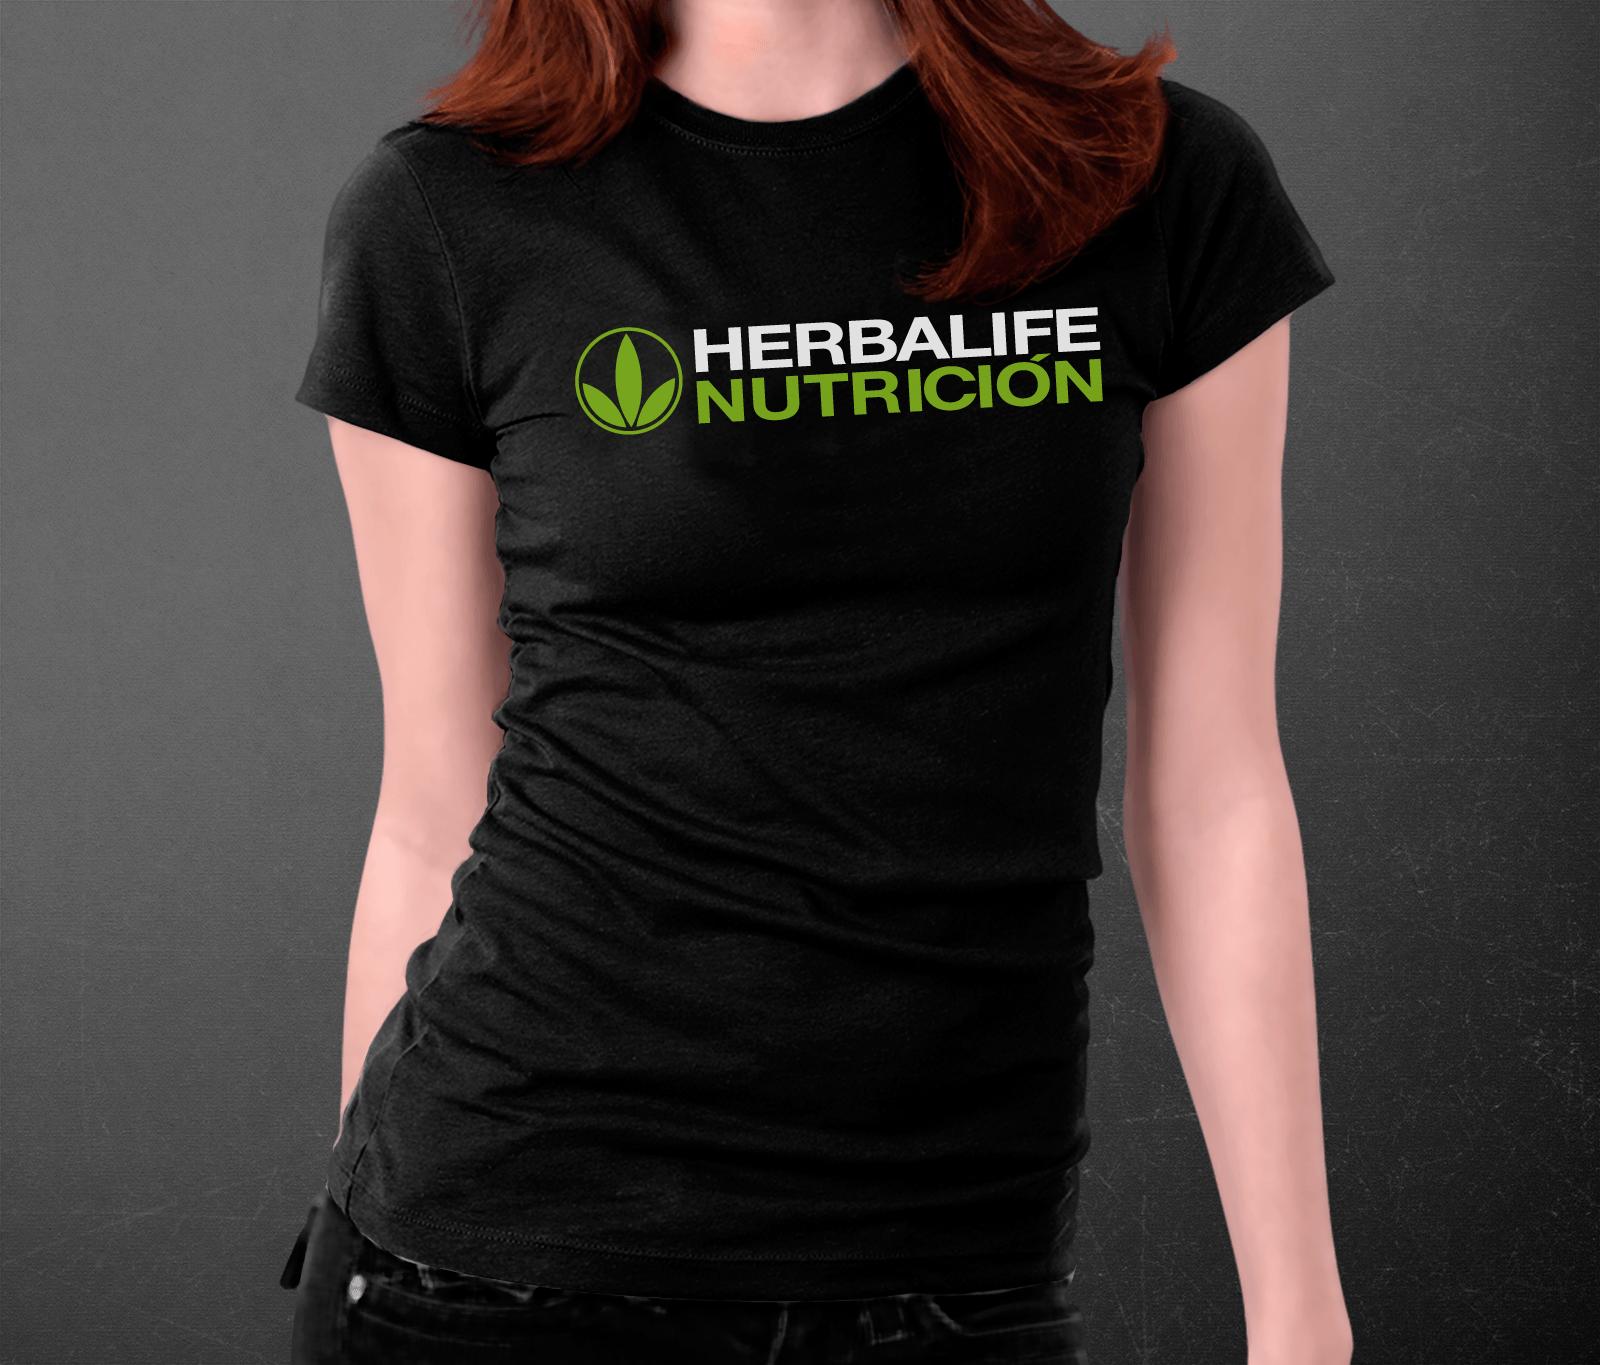 7ac98baaafe Herbalife Hombre Mujer Nutricion Camiseta Negro Basic qtvwnR6